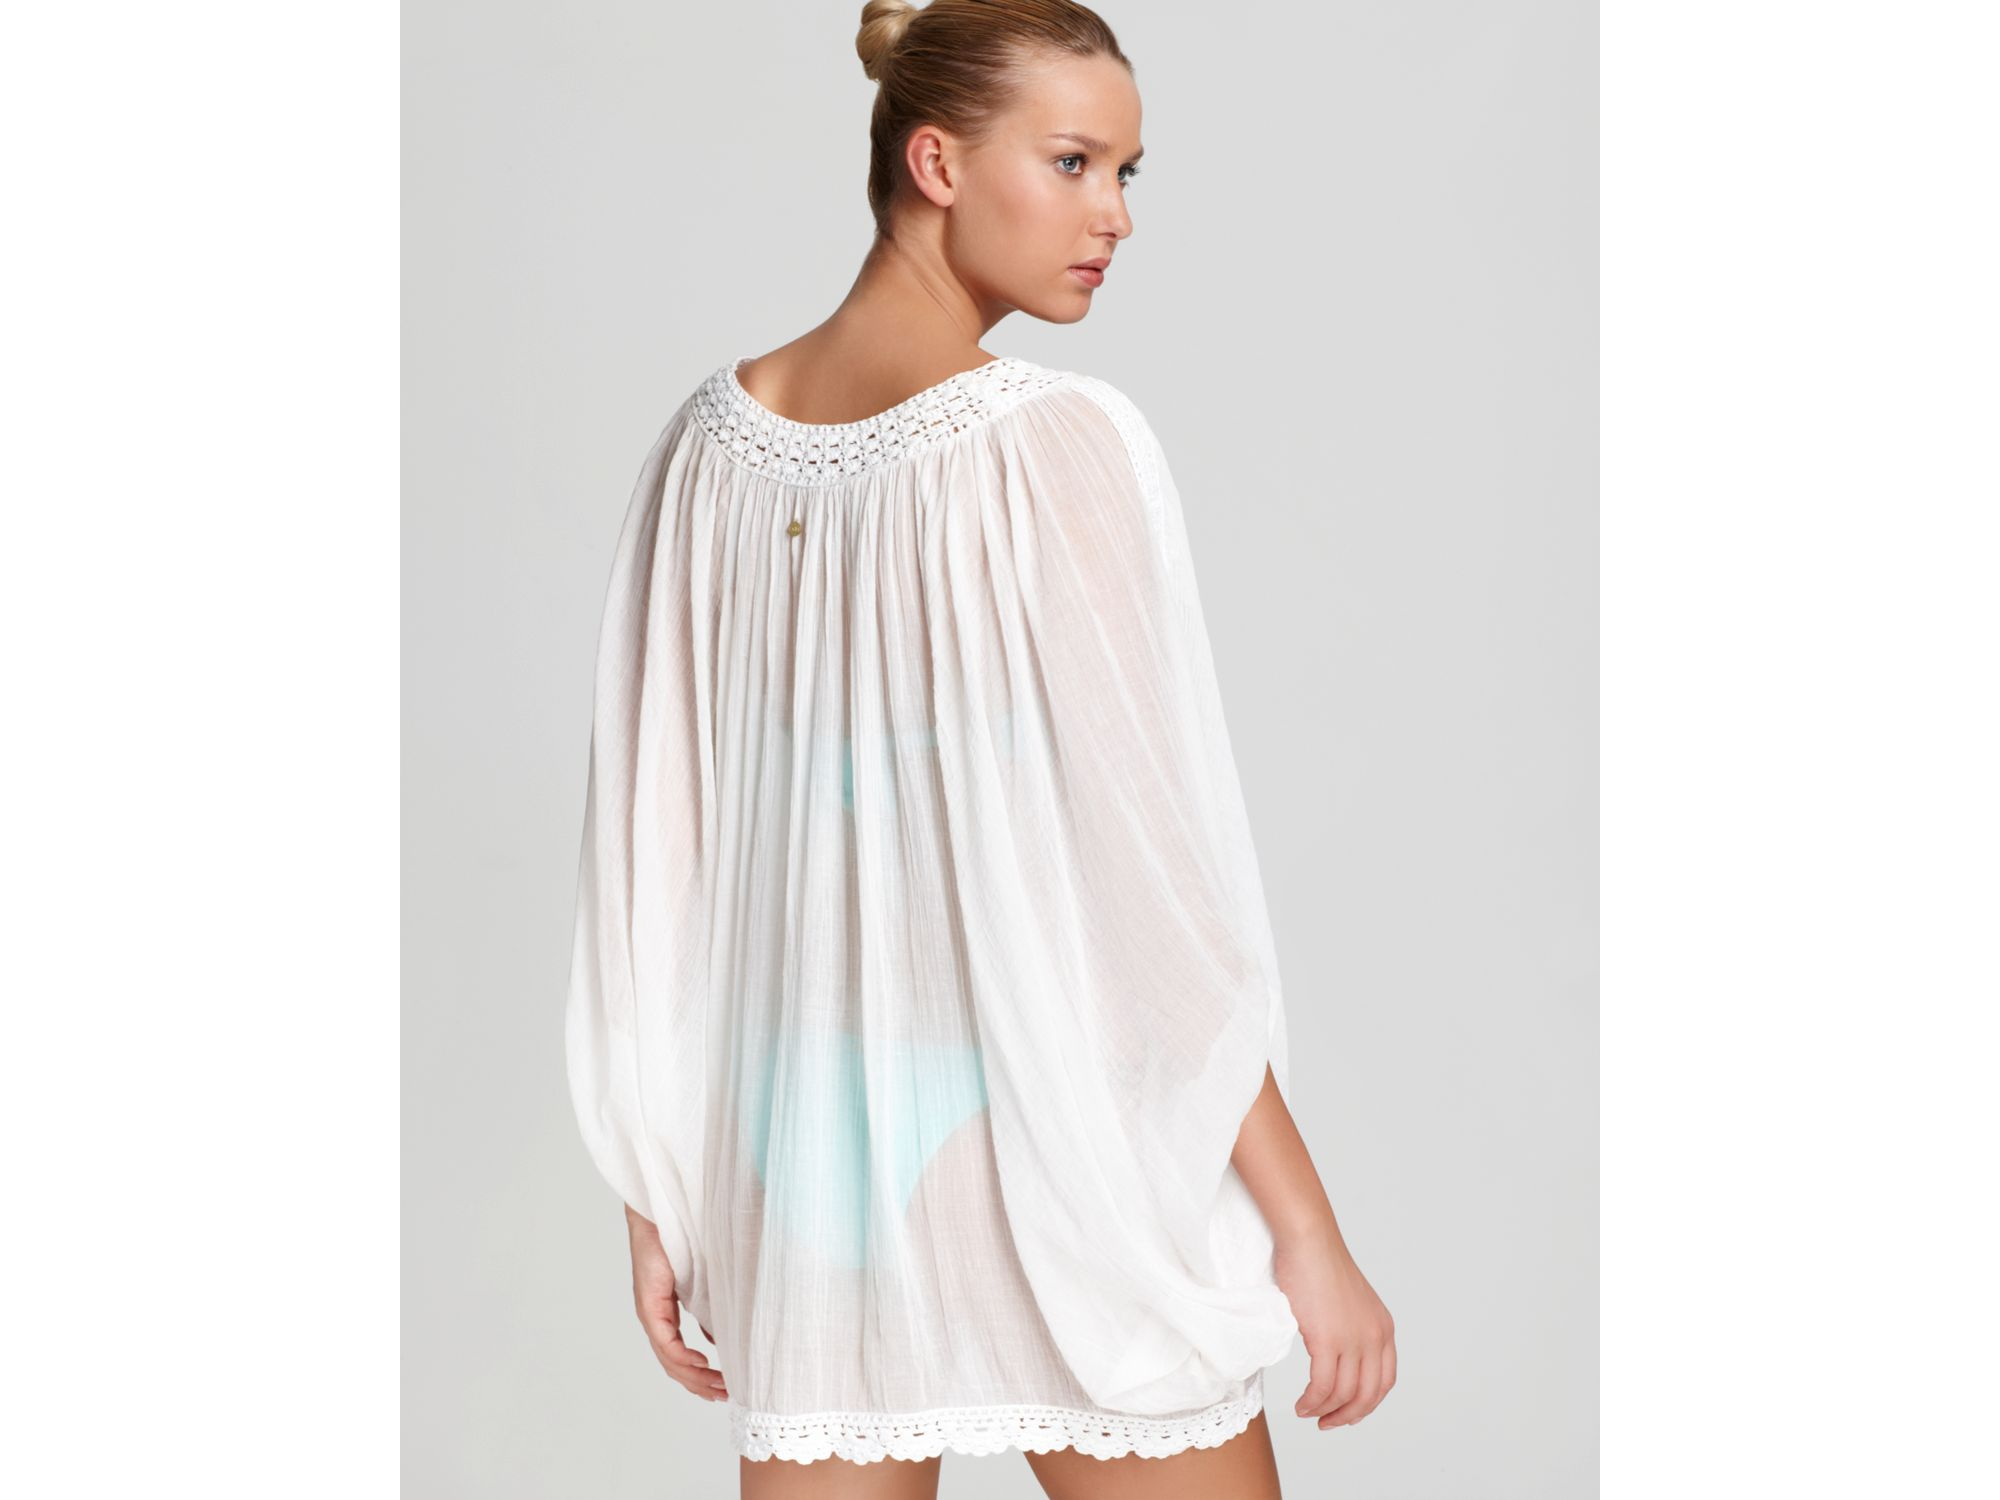 40972cfc6eb OndadeMar Swim Coverup Cotton Gauze and Crochet Tunic in White - Lyst